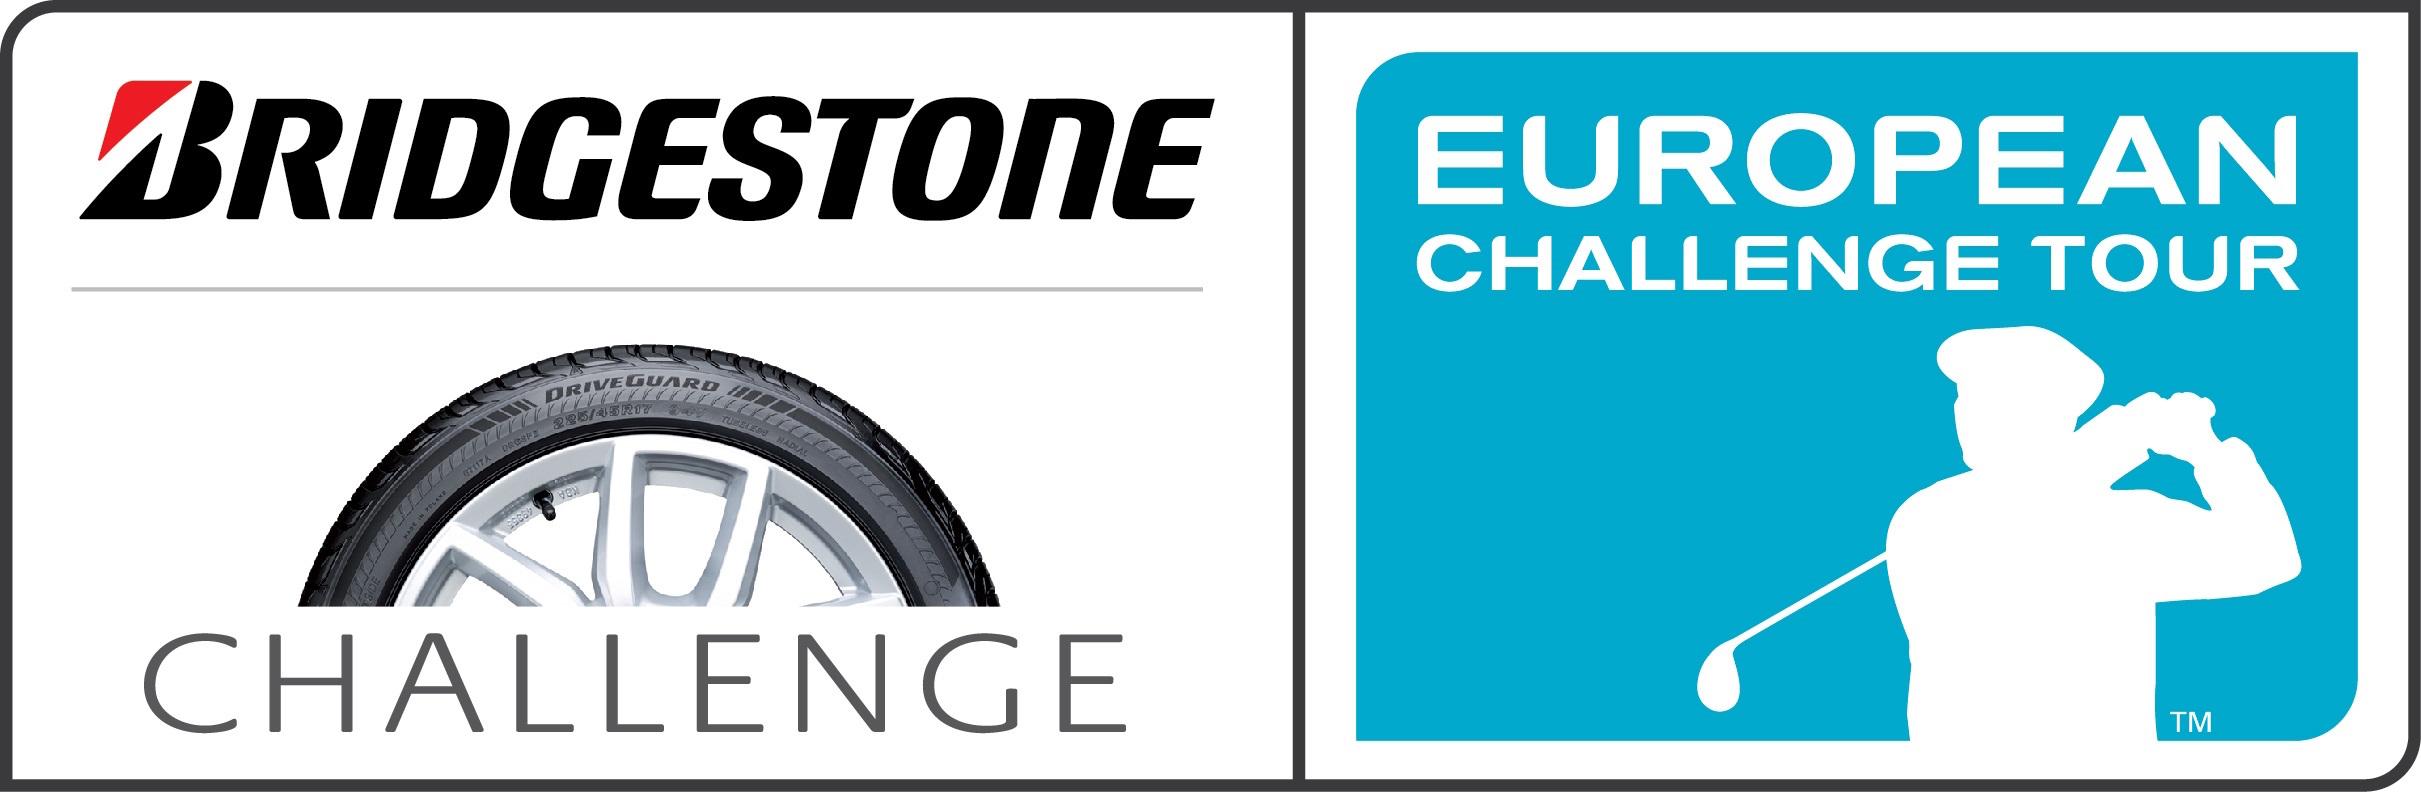 Bridgestone Challenge comes to Heythrop Park